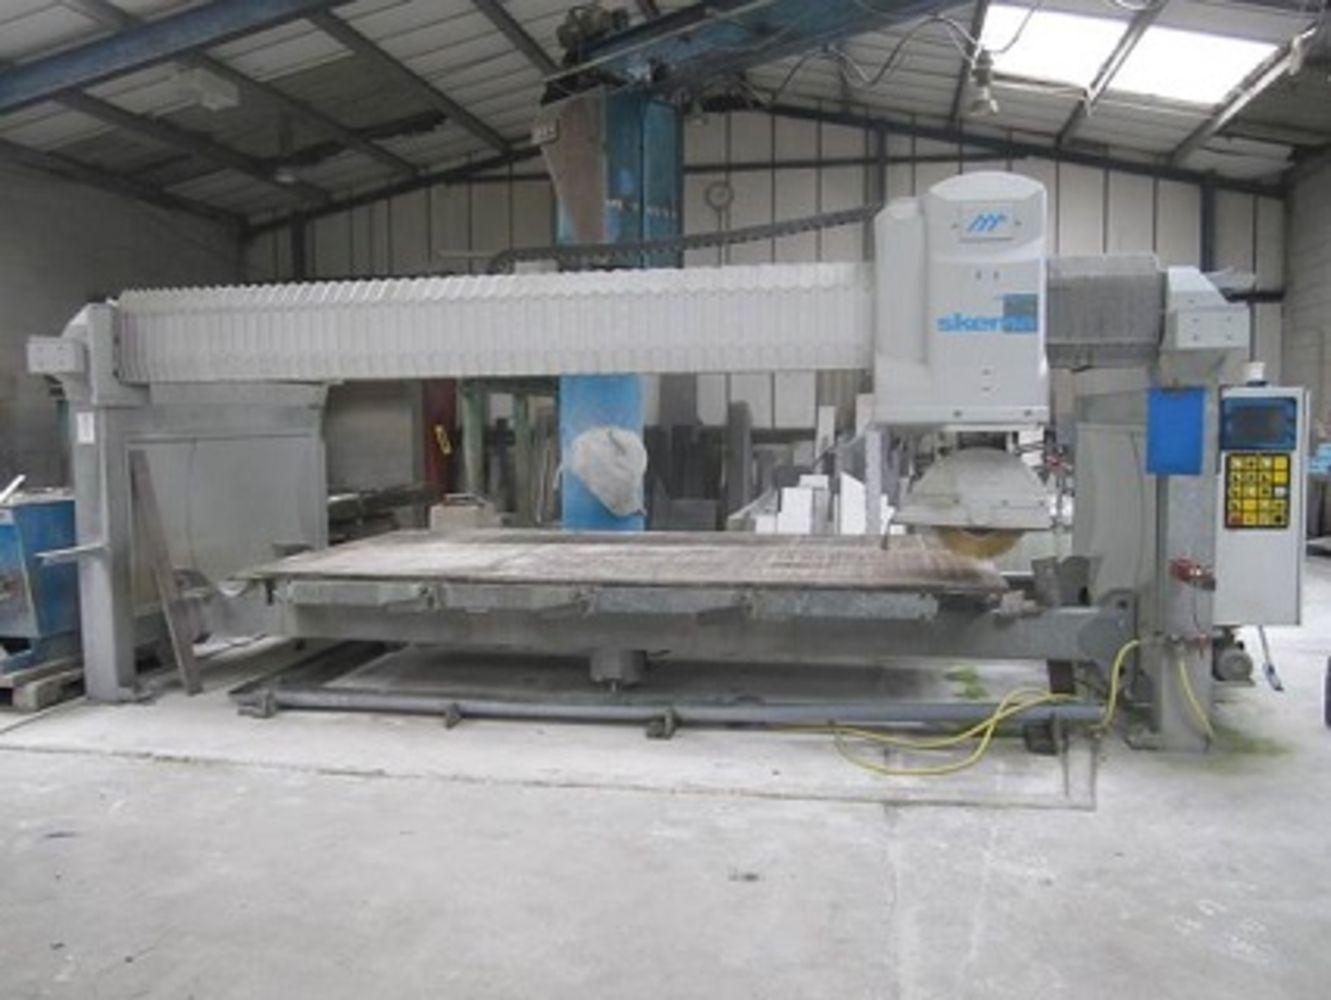 Trebarwith Stoneworks Ltd - Range of modern stone cutting/processing machinery, forklift, stone stock, tools, etc.